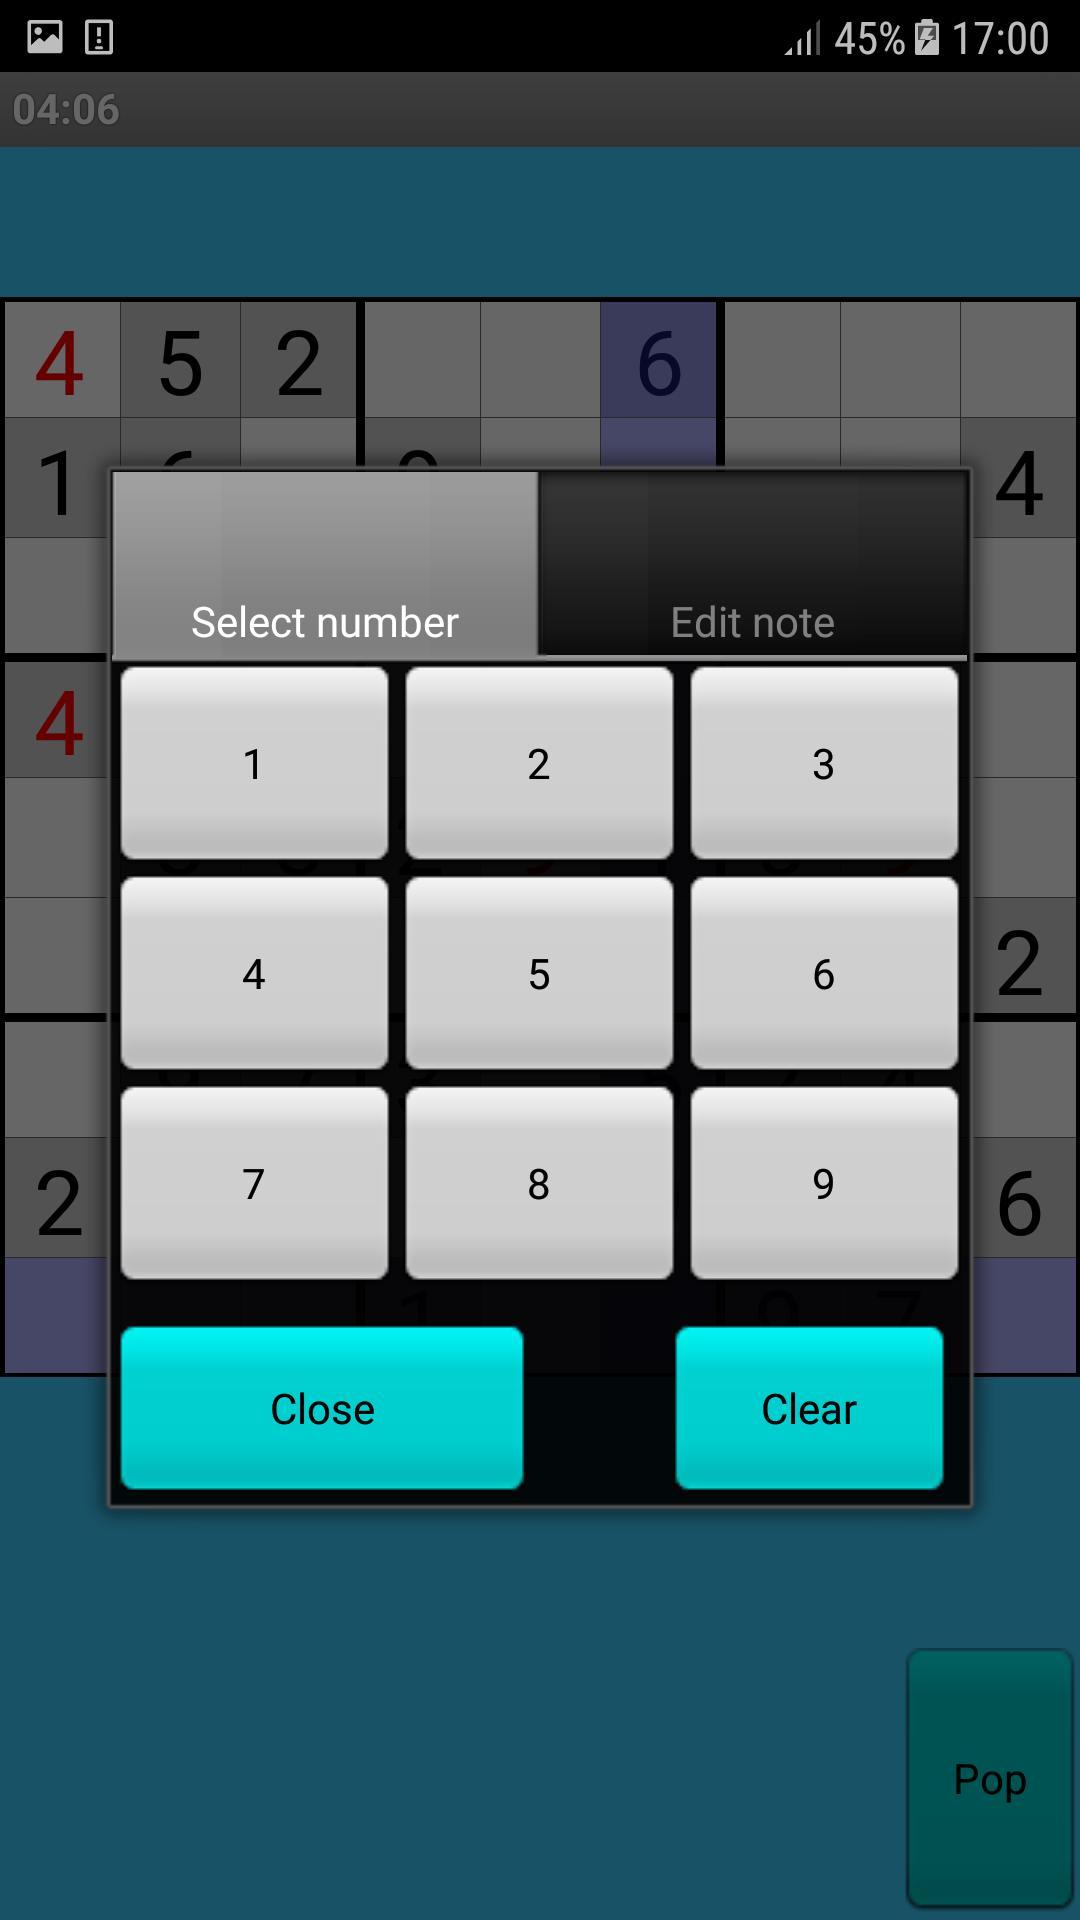 Sudoku Для Андроид - Скачать Apk pour Sudoku A Imprimer